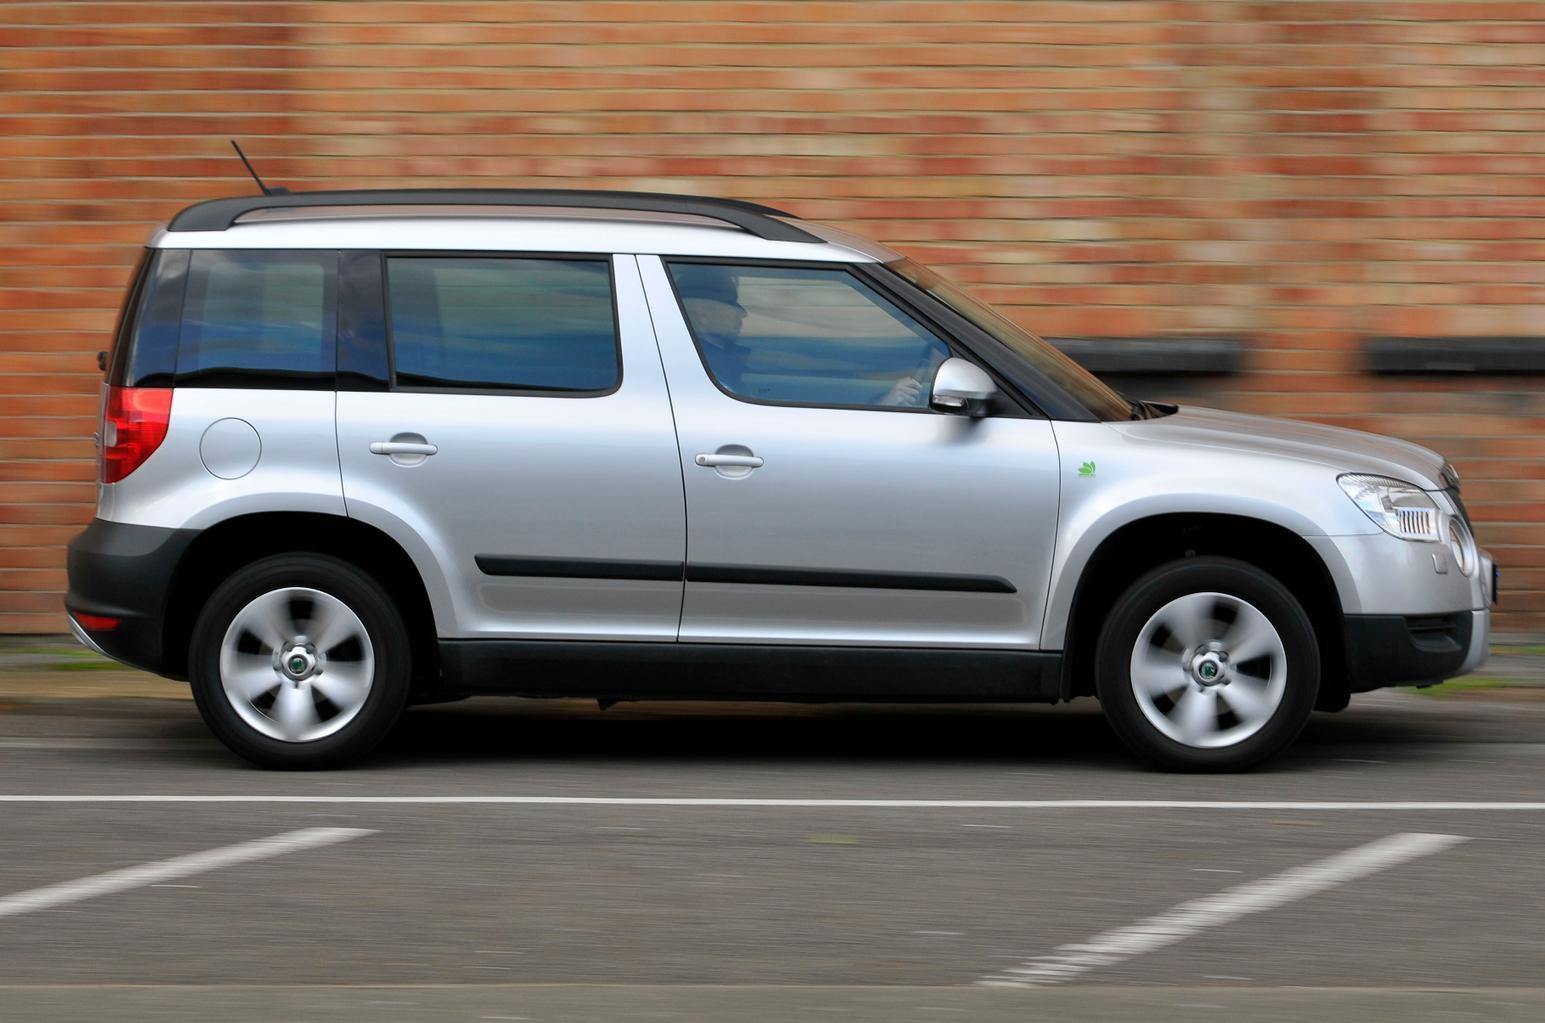 Used SUVs tested: Nissan Qashqai vs Peugeot 3008 vs Skoda Yeti